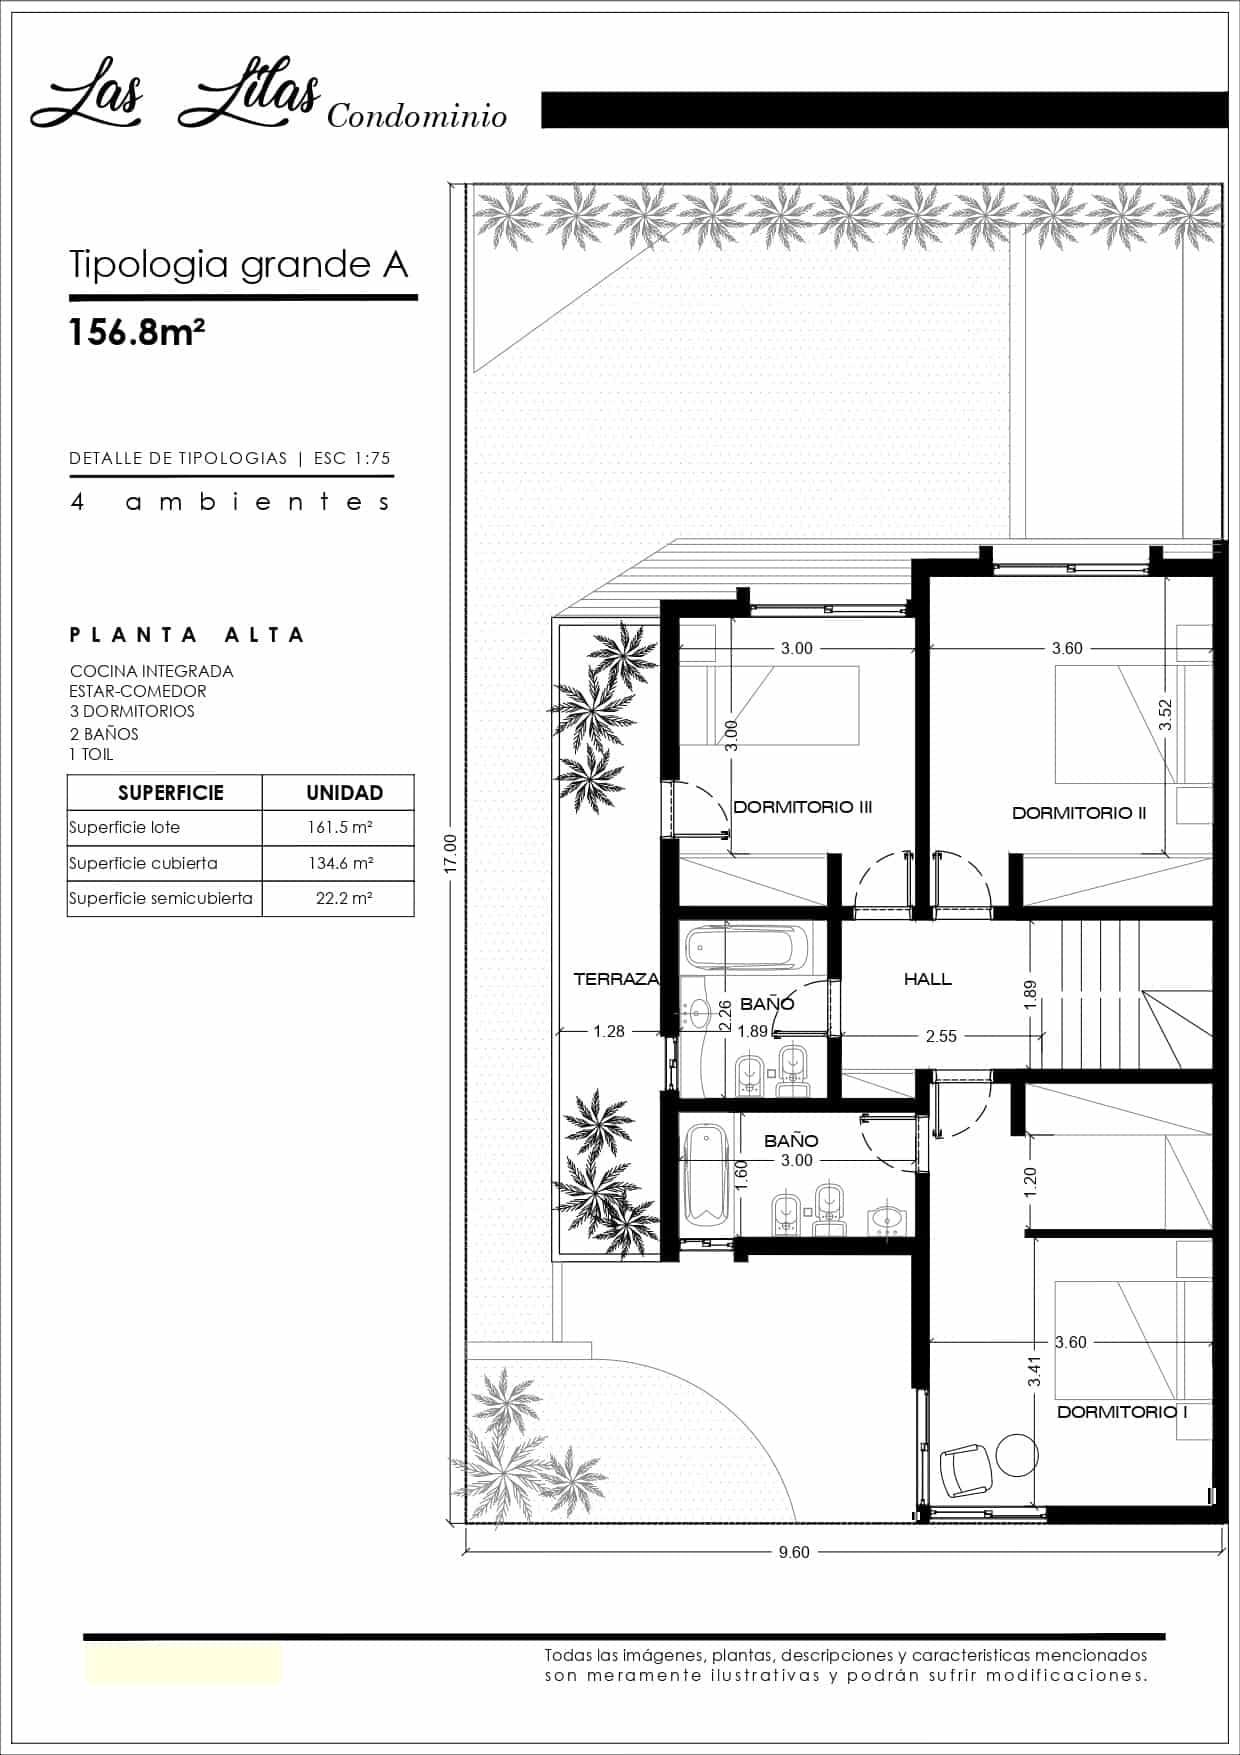 Las lillas condominio- Tipologia Grande - PA_page-0001.jpg